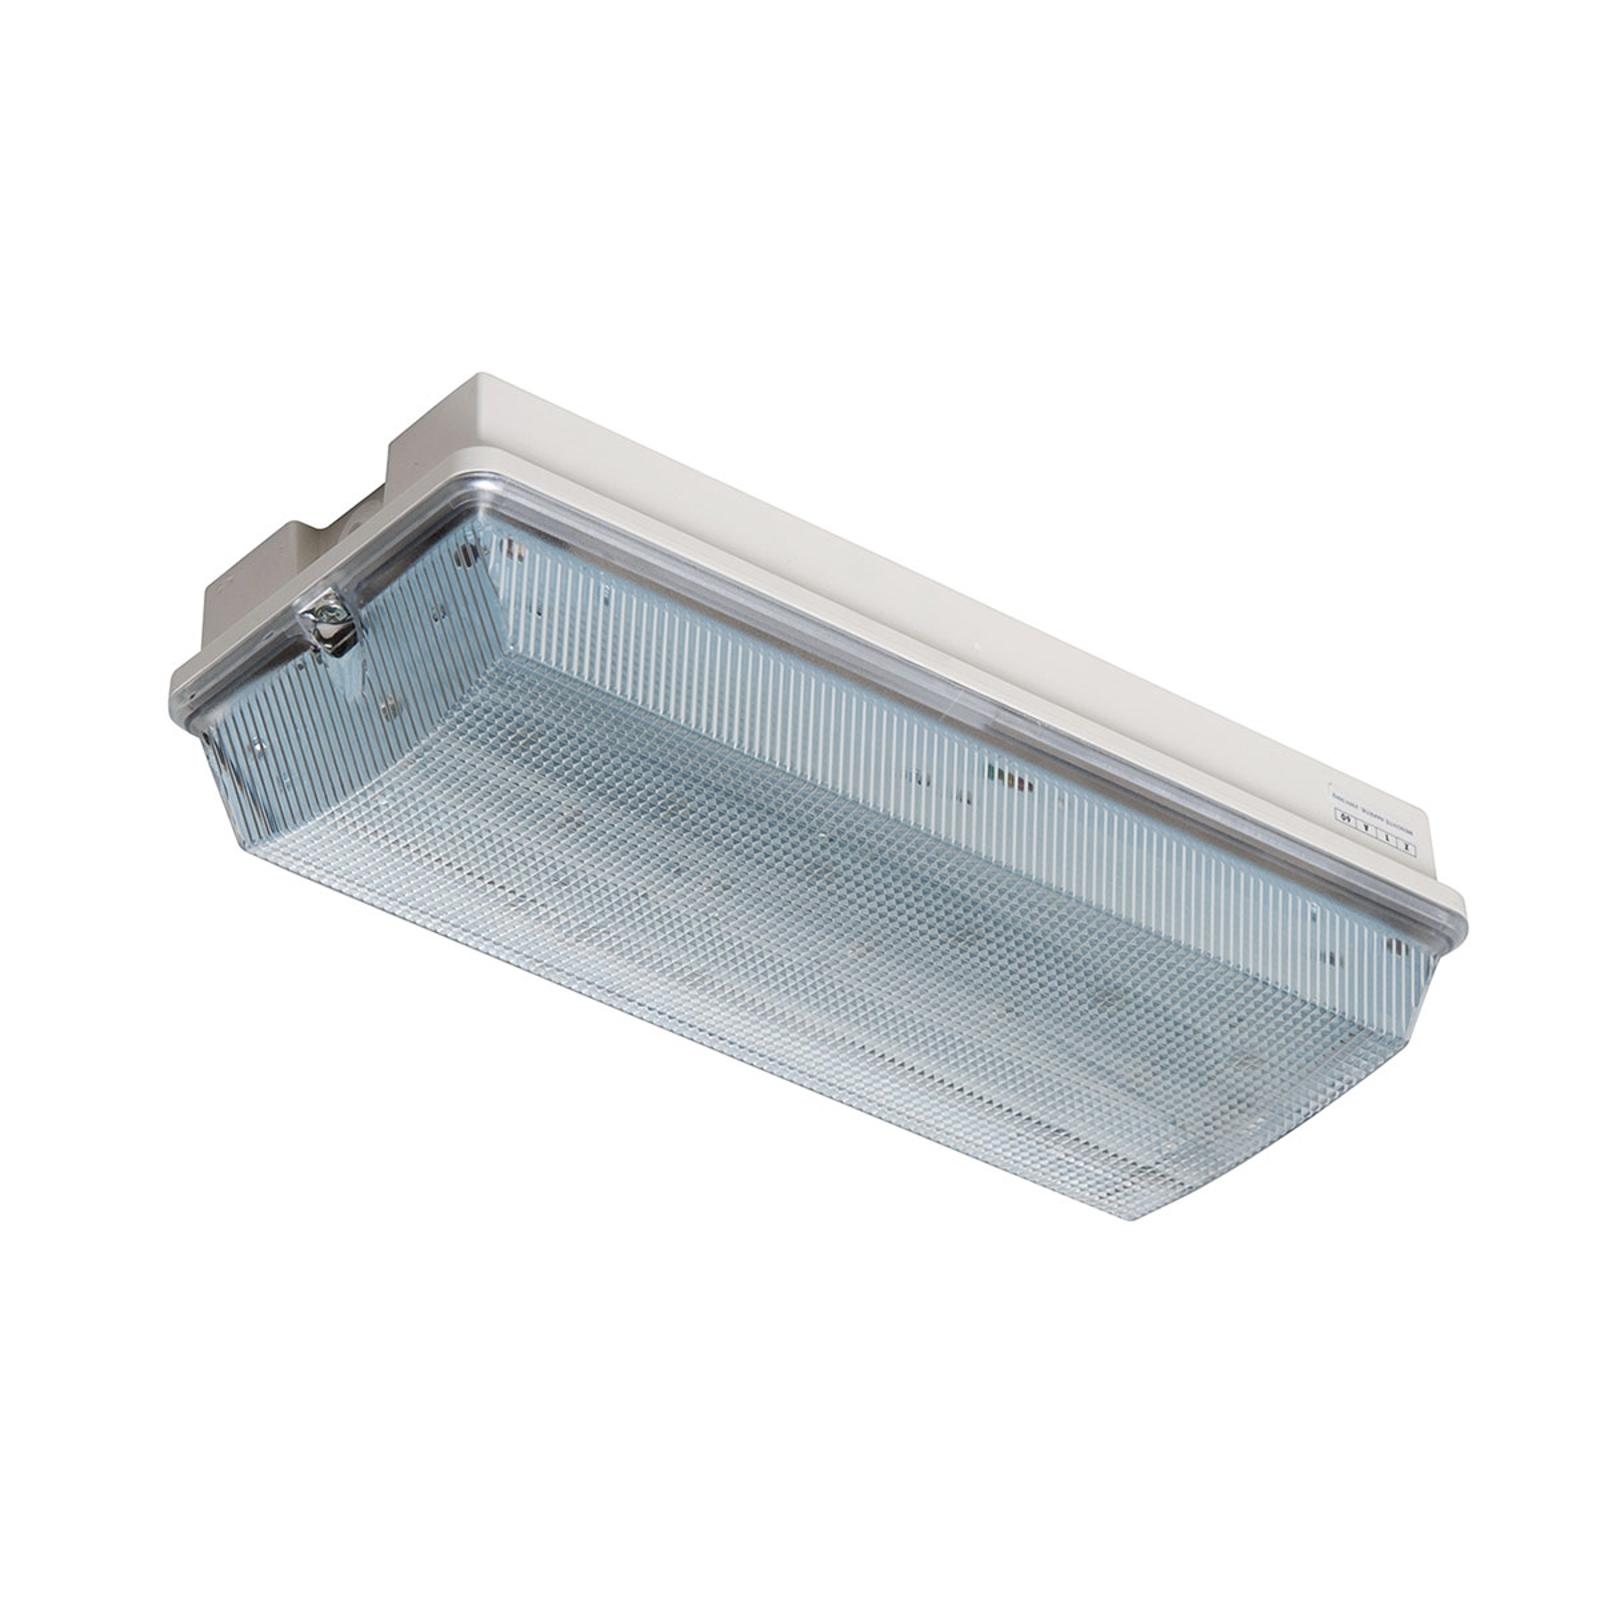 Lampa ewakuacyjna LED Frost-Lux do -30°C